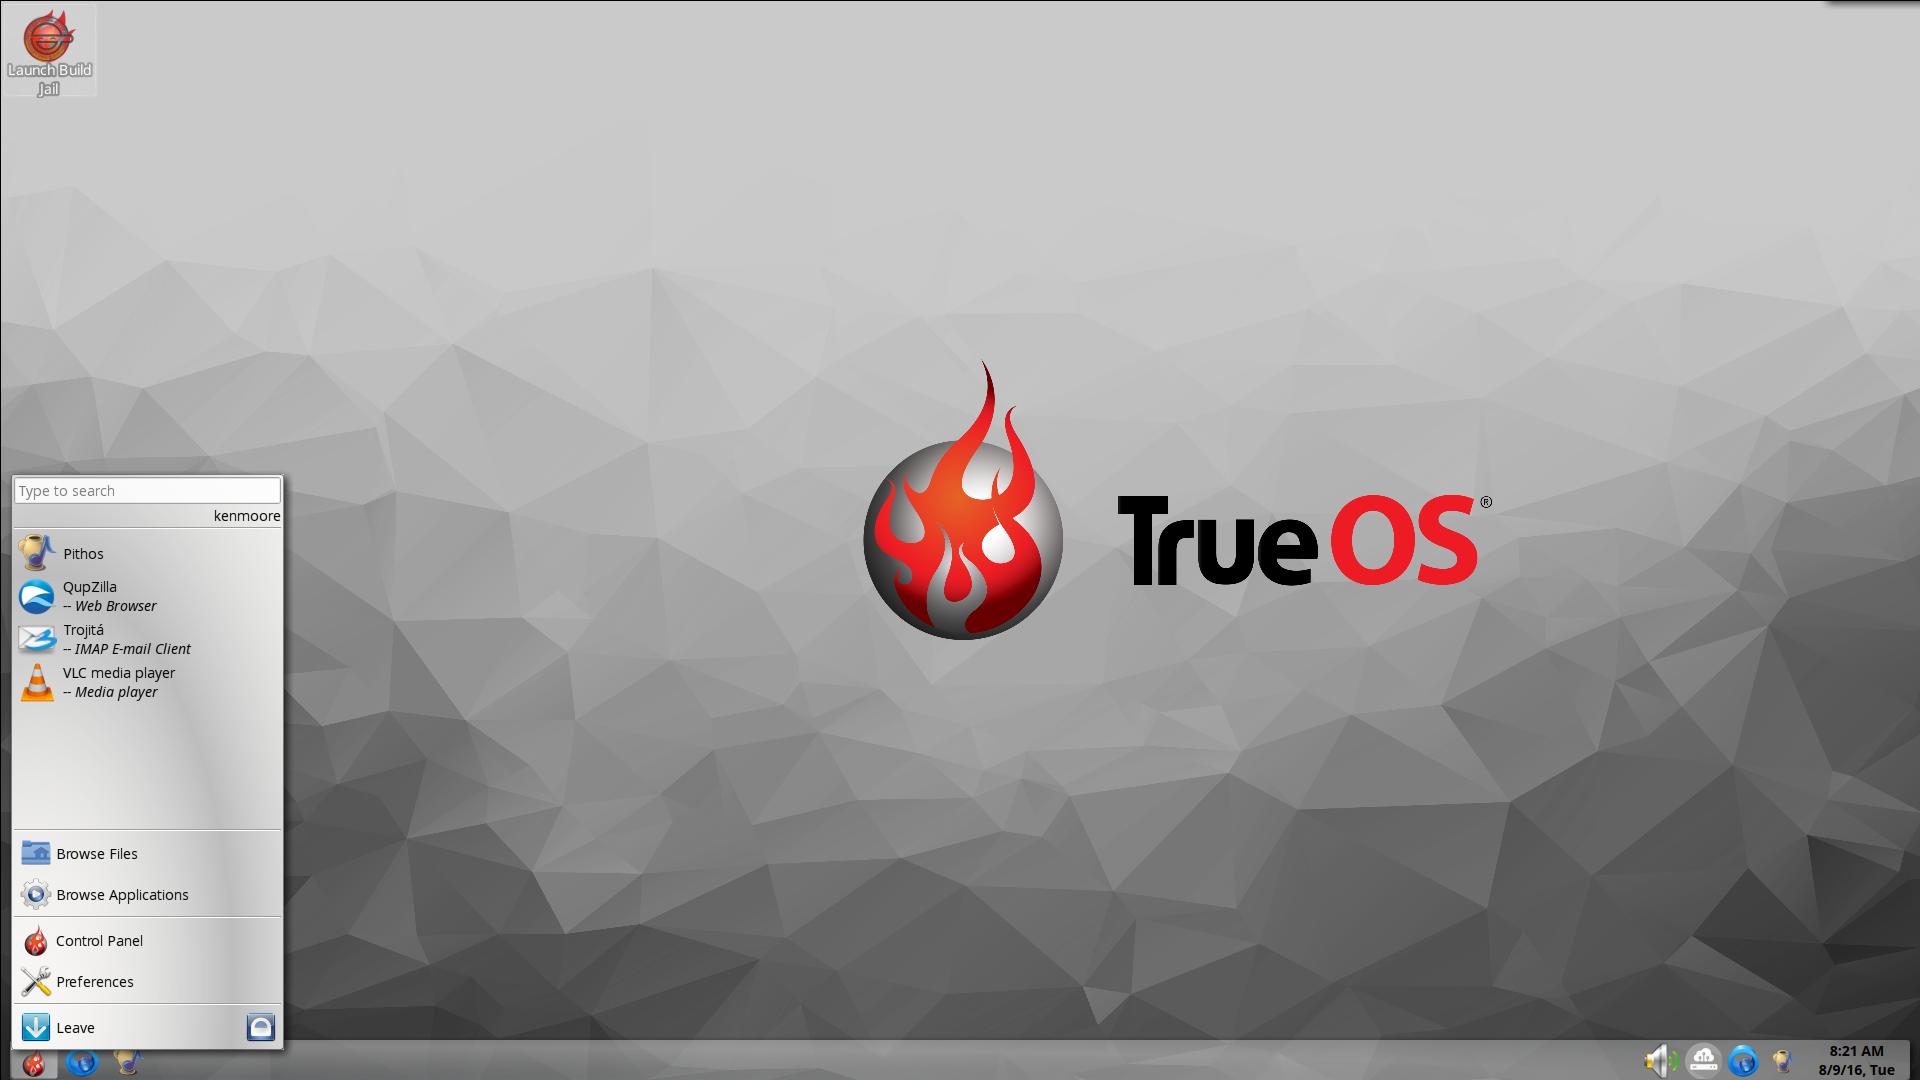 TrueOS - Wikipedia